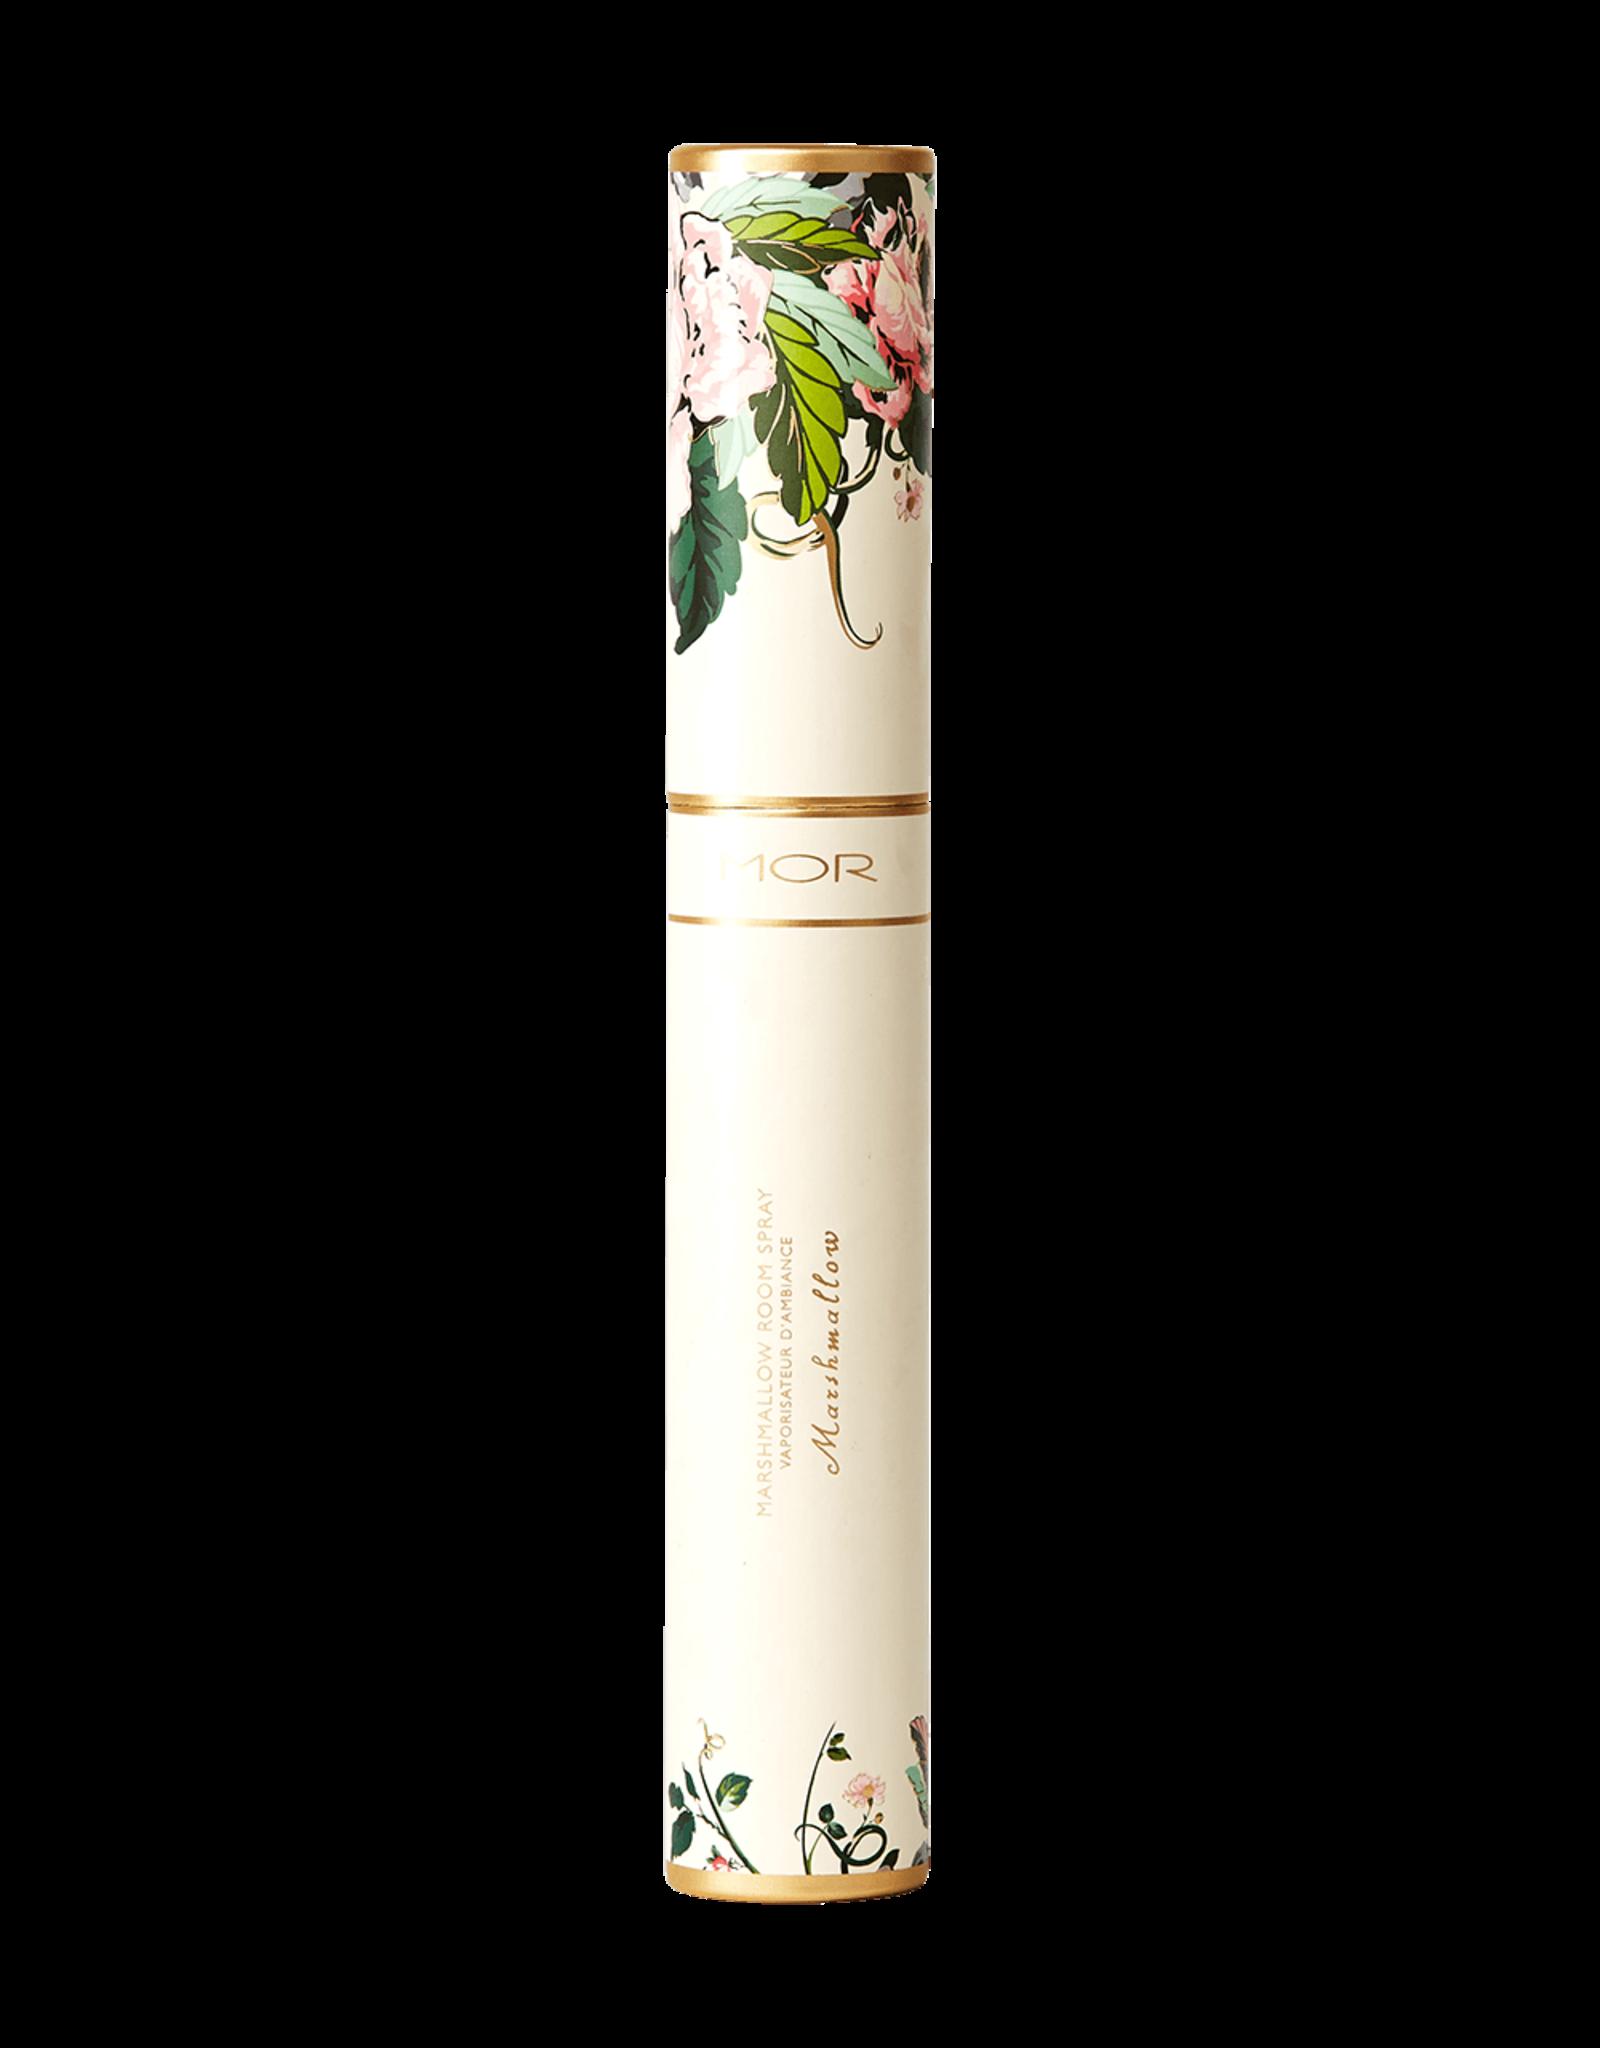 MOR AUSTRALIA Marshmallow Room Spray 90ml